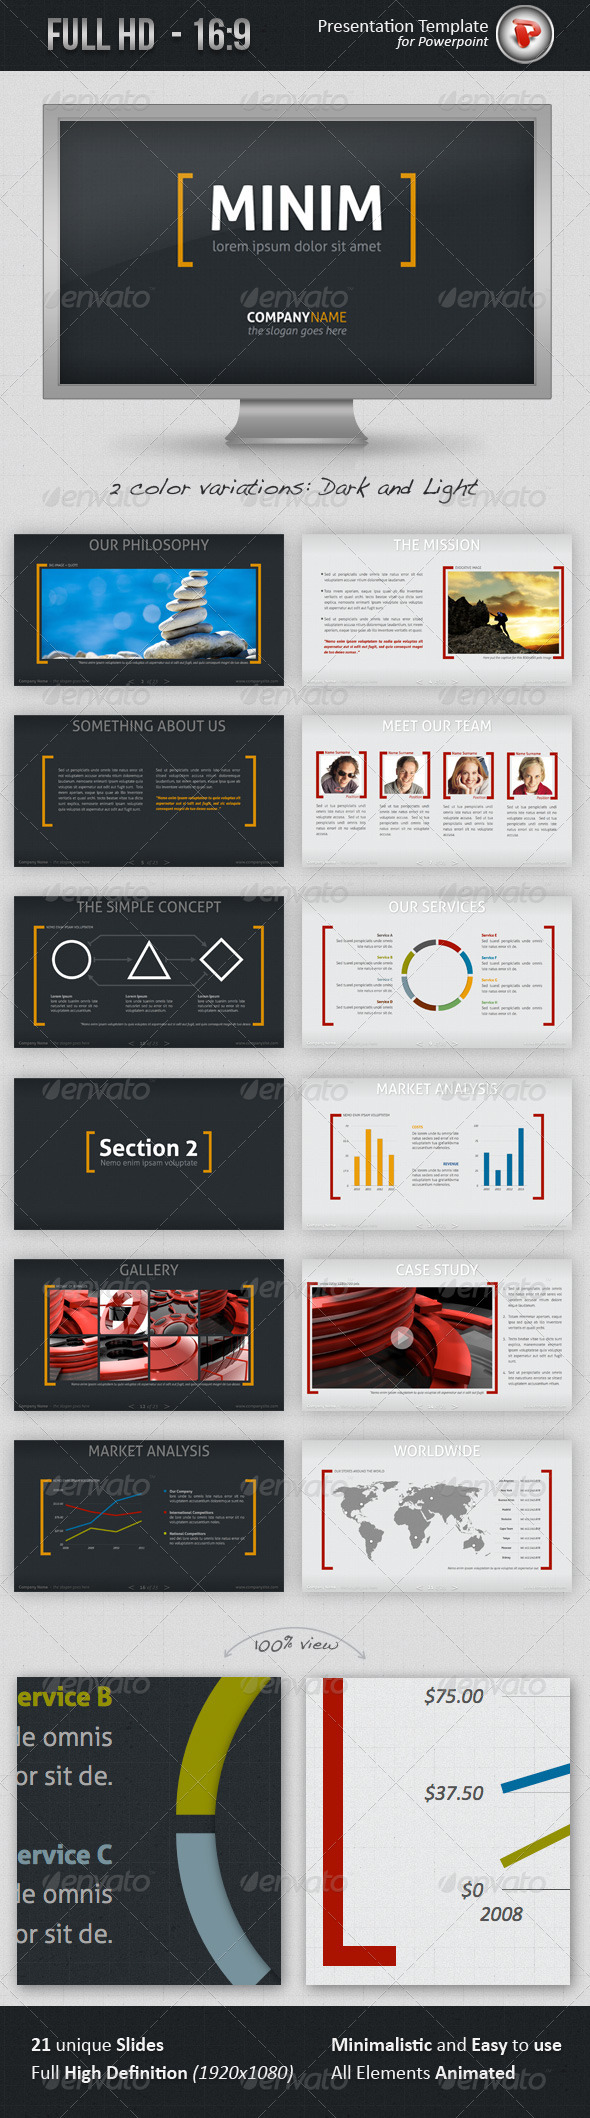 GraphicRiver Minim Powerpoint Template 3127588